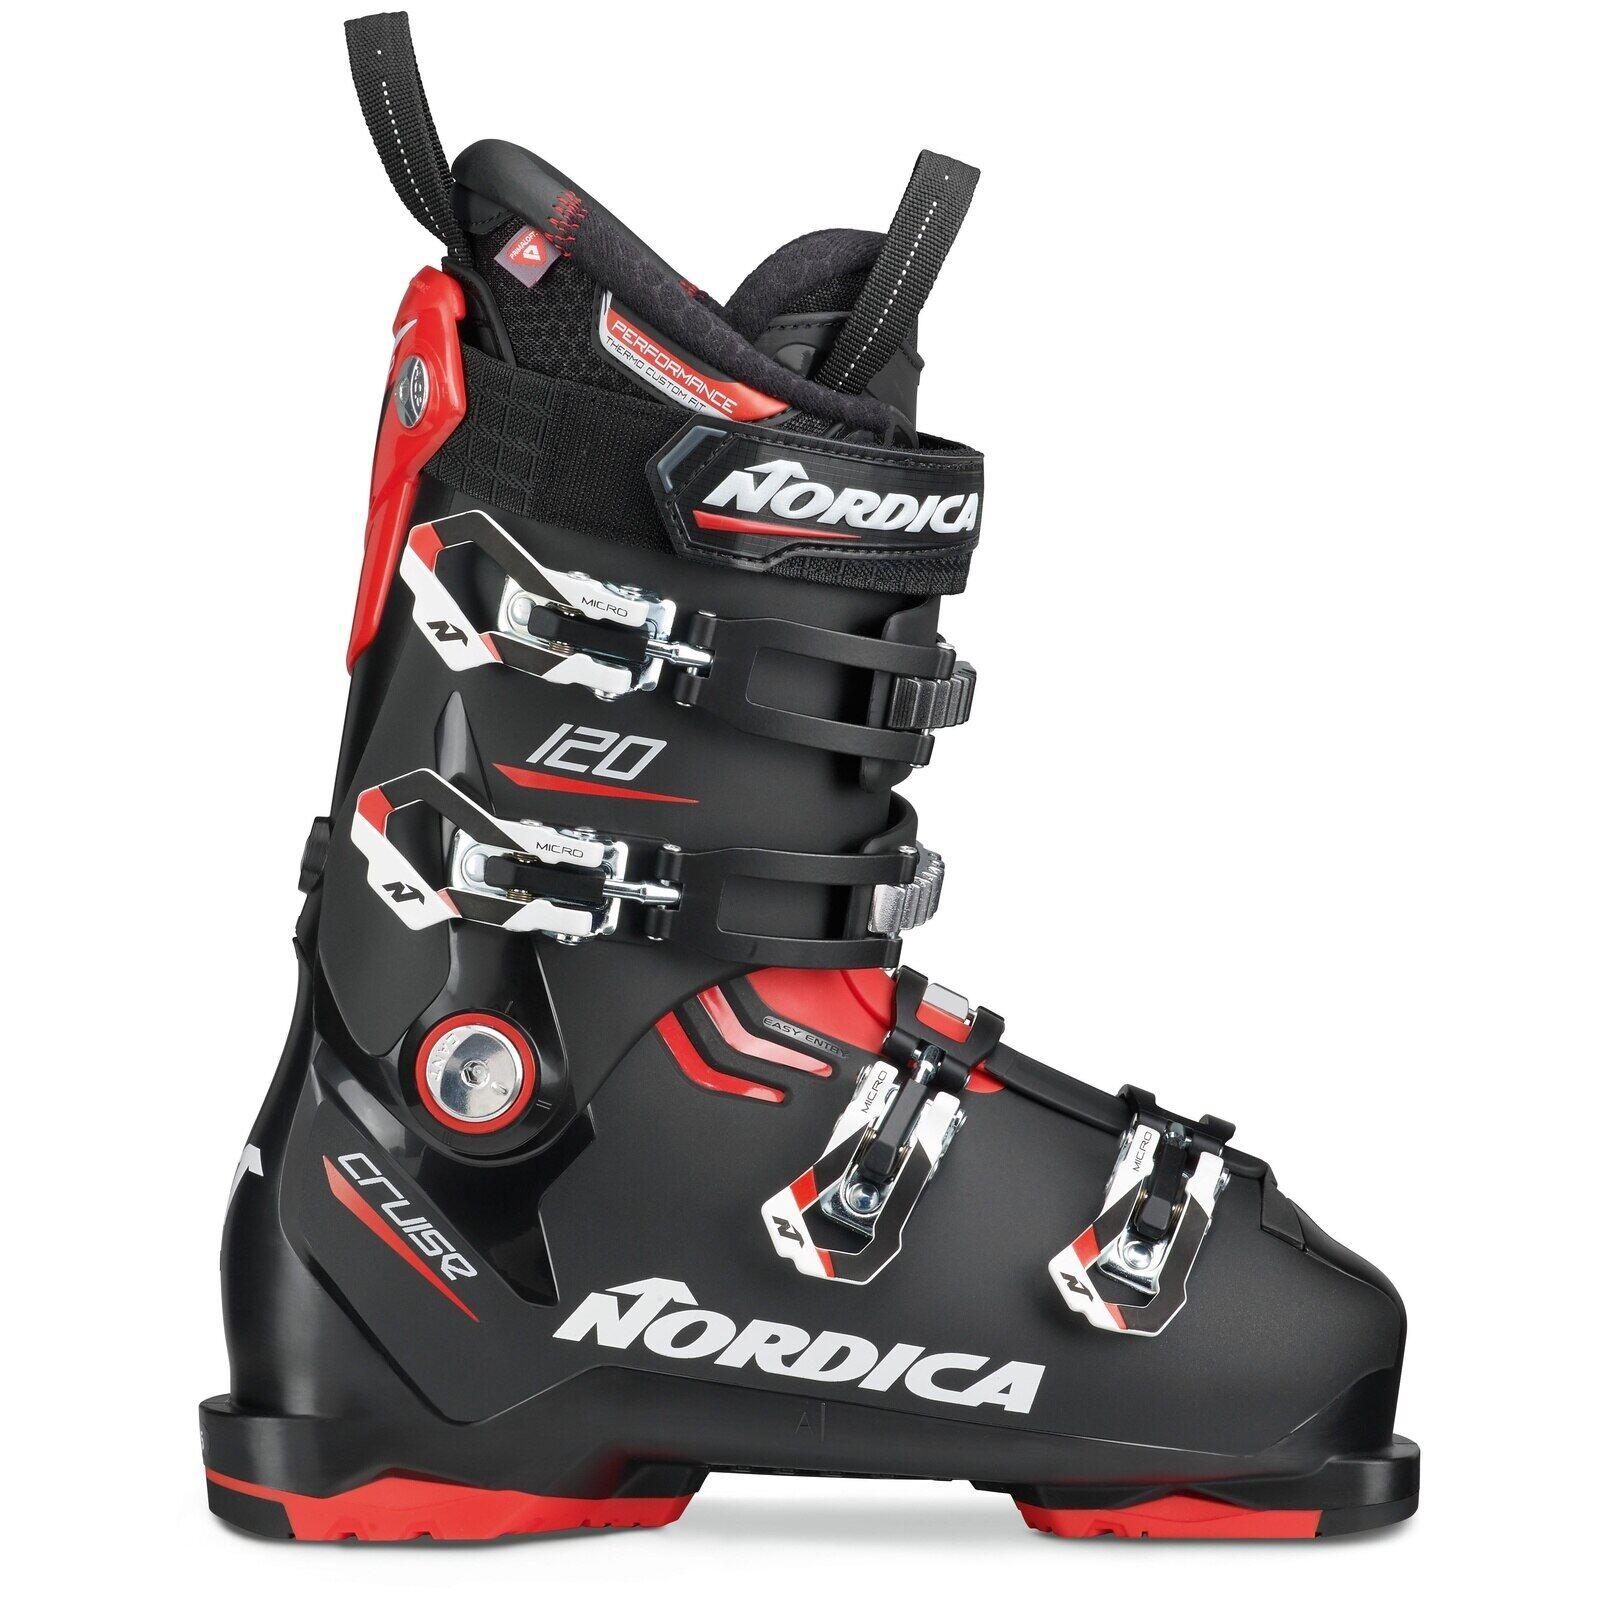 Nordica Men's Cruise 120 Ski Boots on